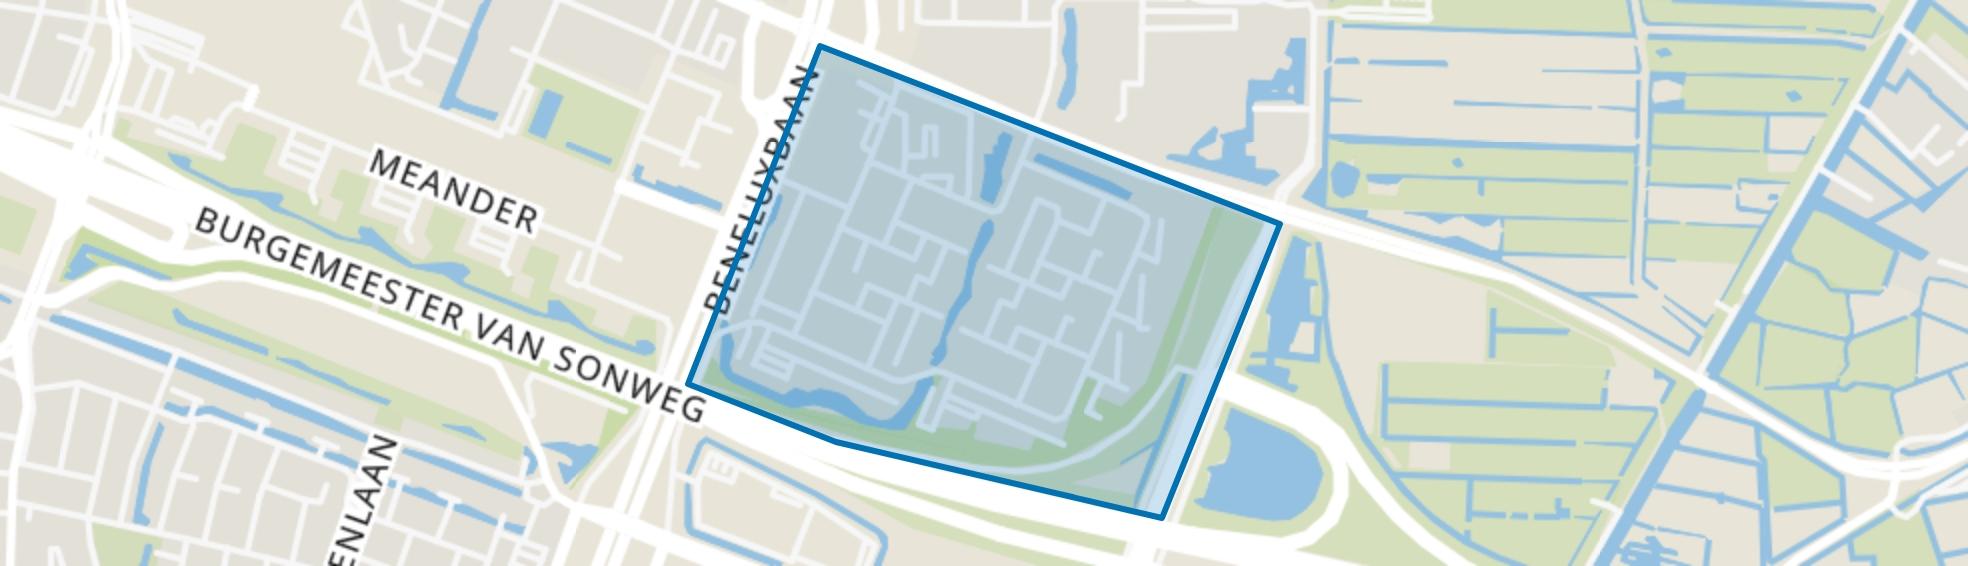 Operabuurt, Amstelveen map